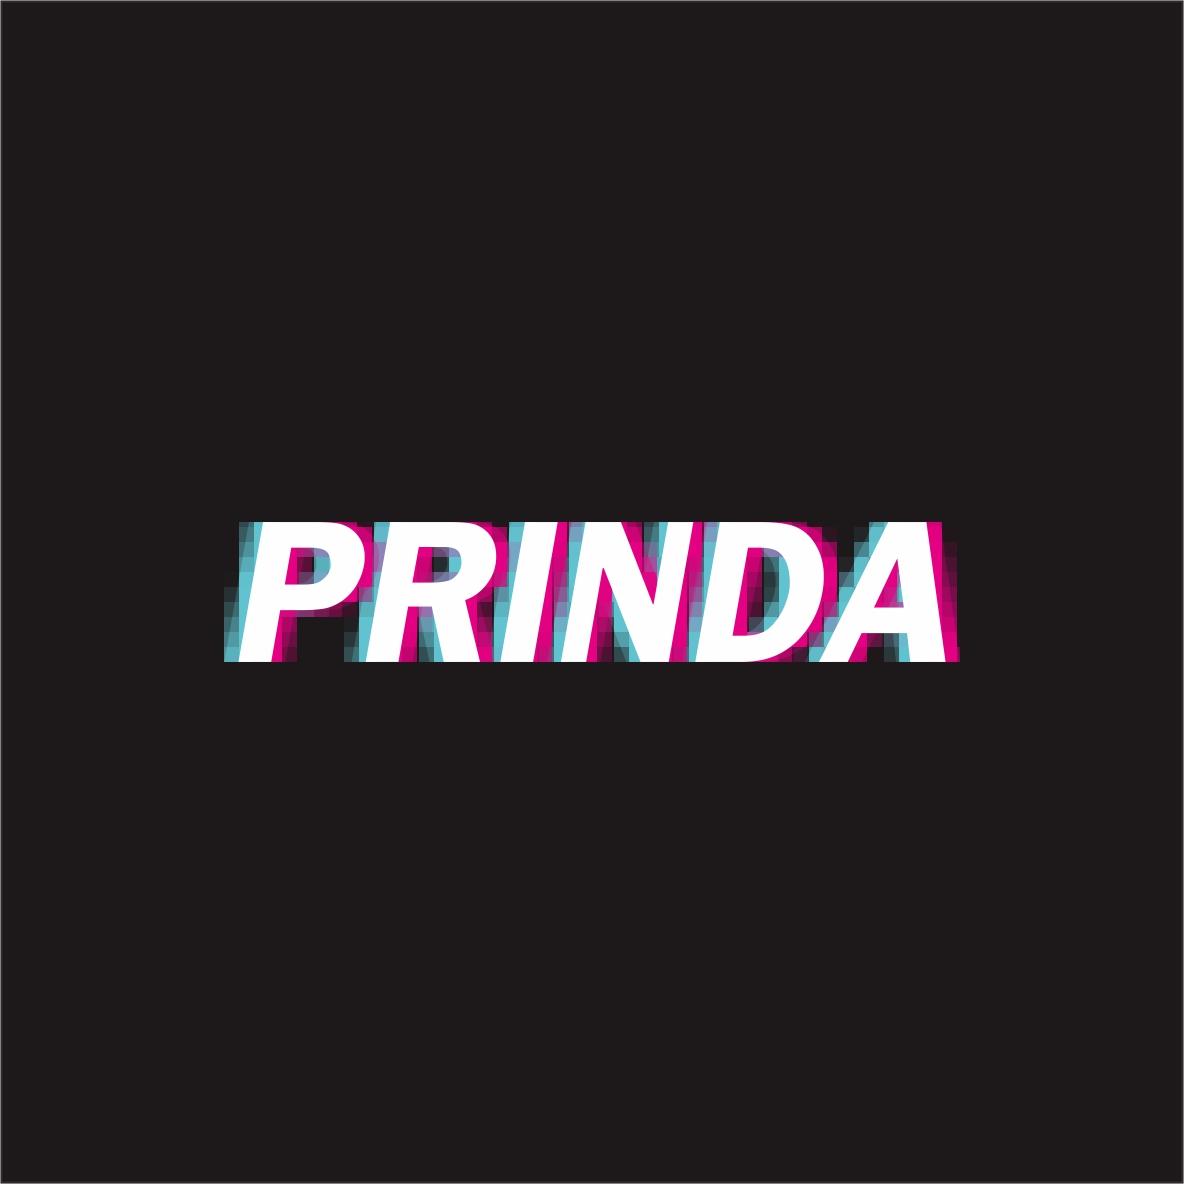 Prinda